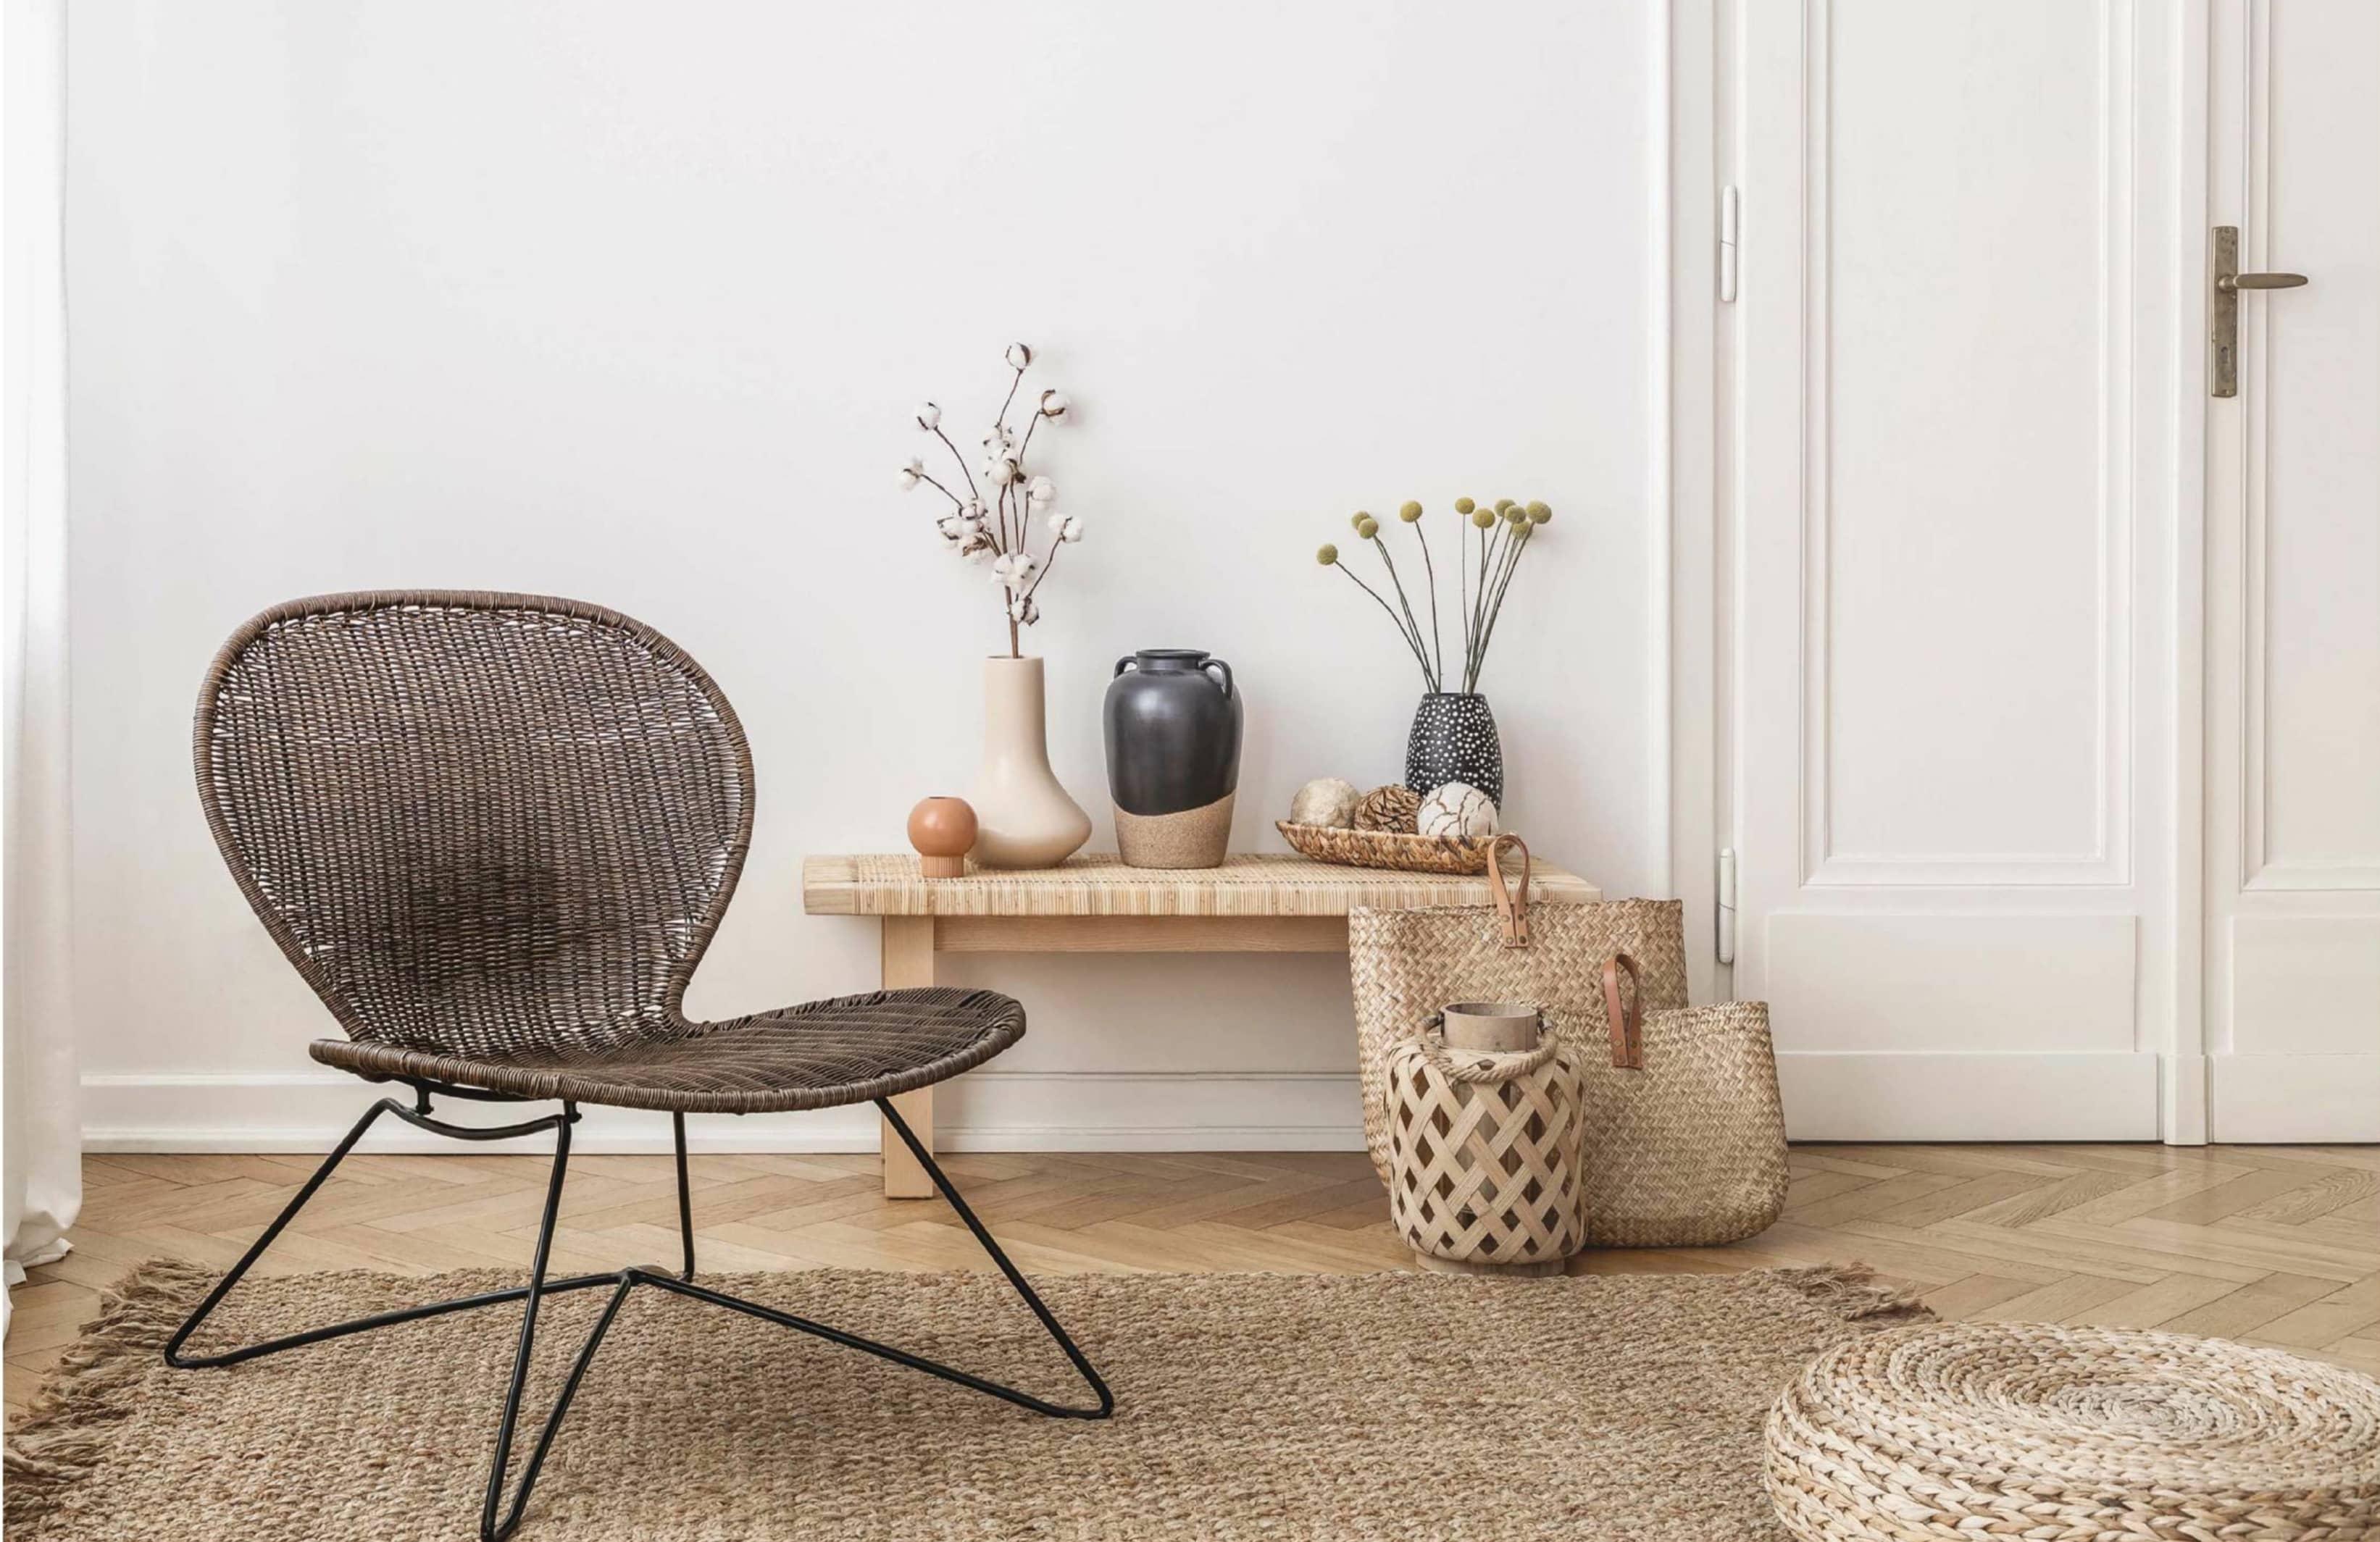 harmony furnishings and interior design kits